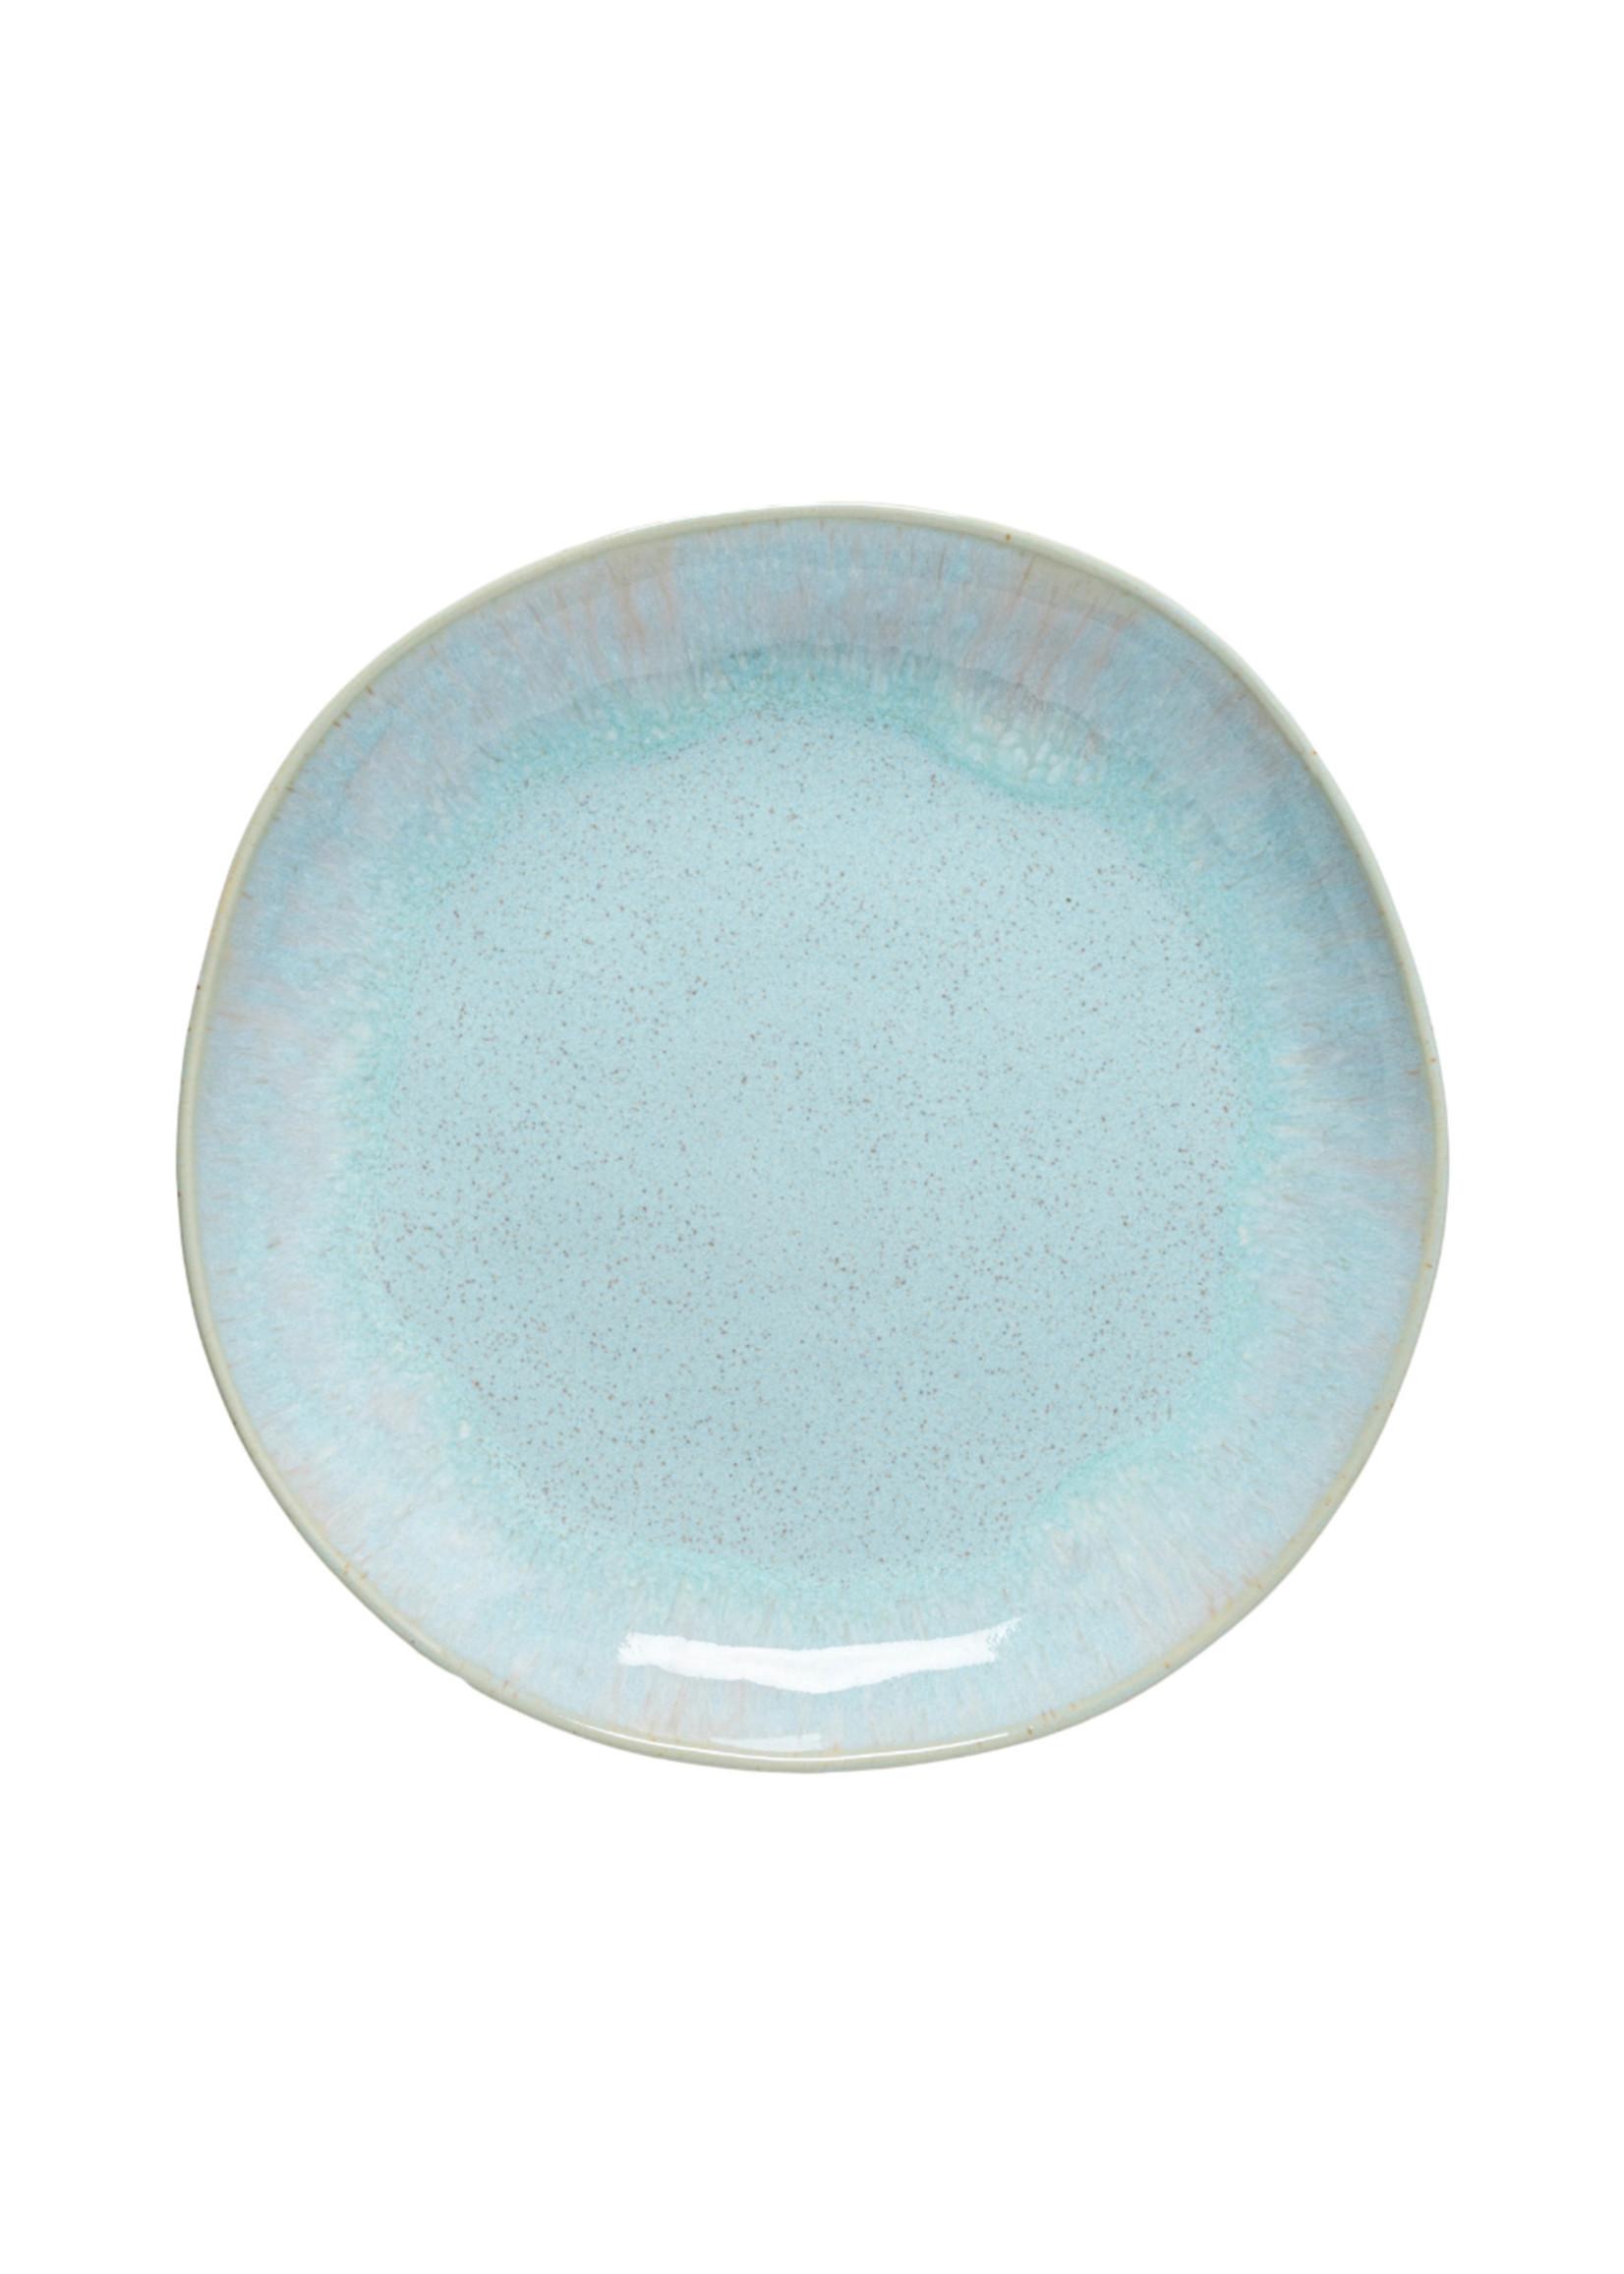 Casafina Eivissa Salad Plate